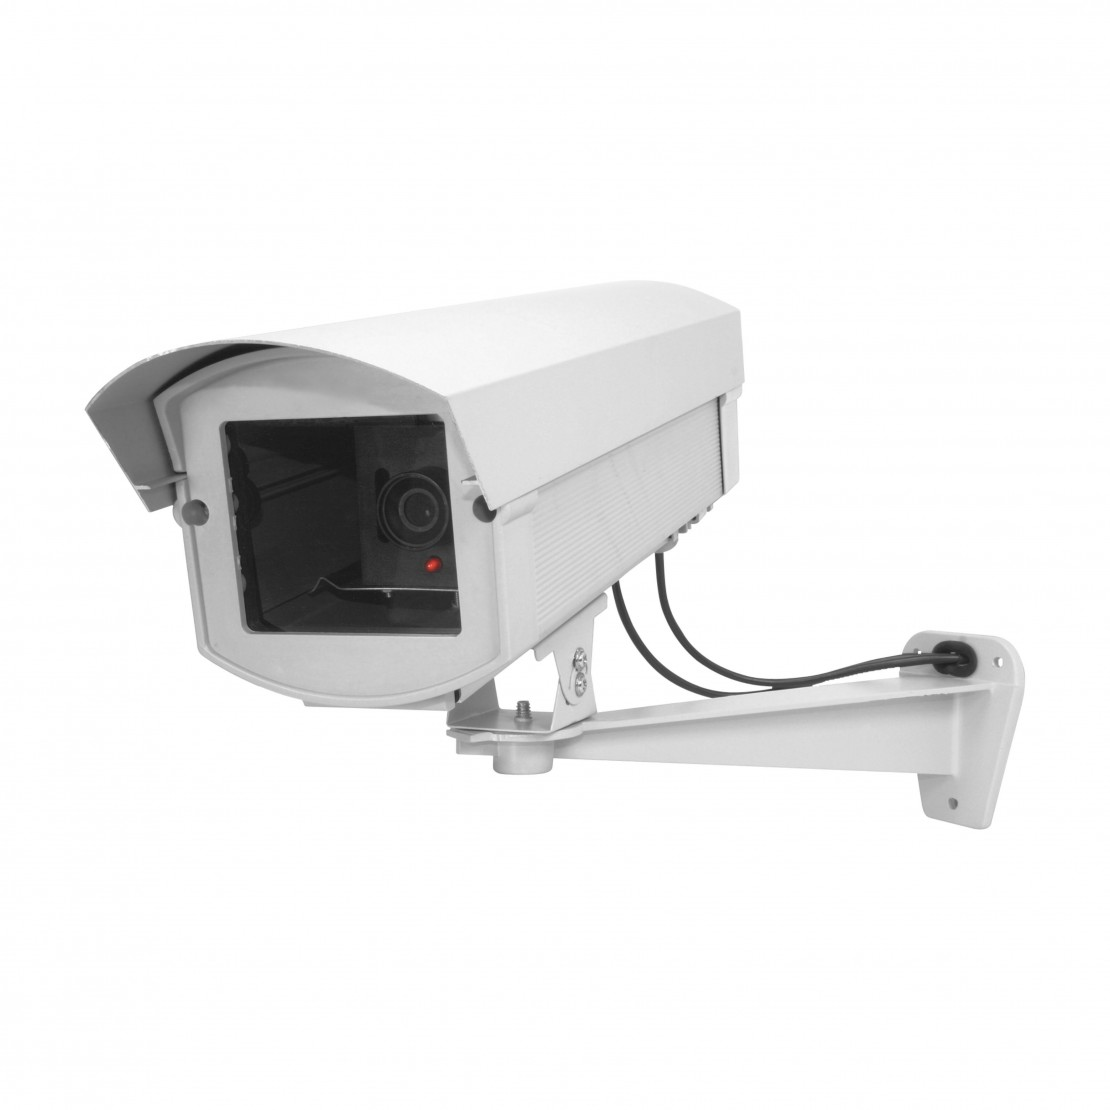 Caméra factice en aluminium avec LED